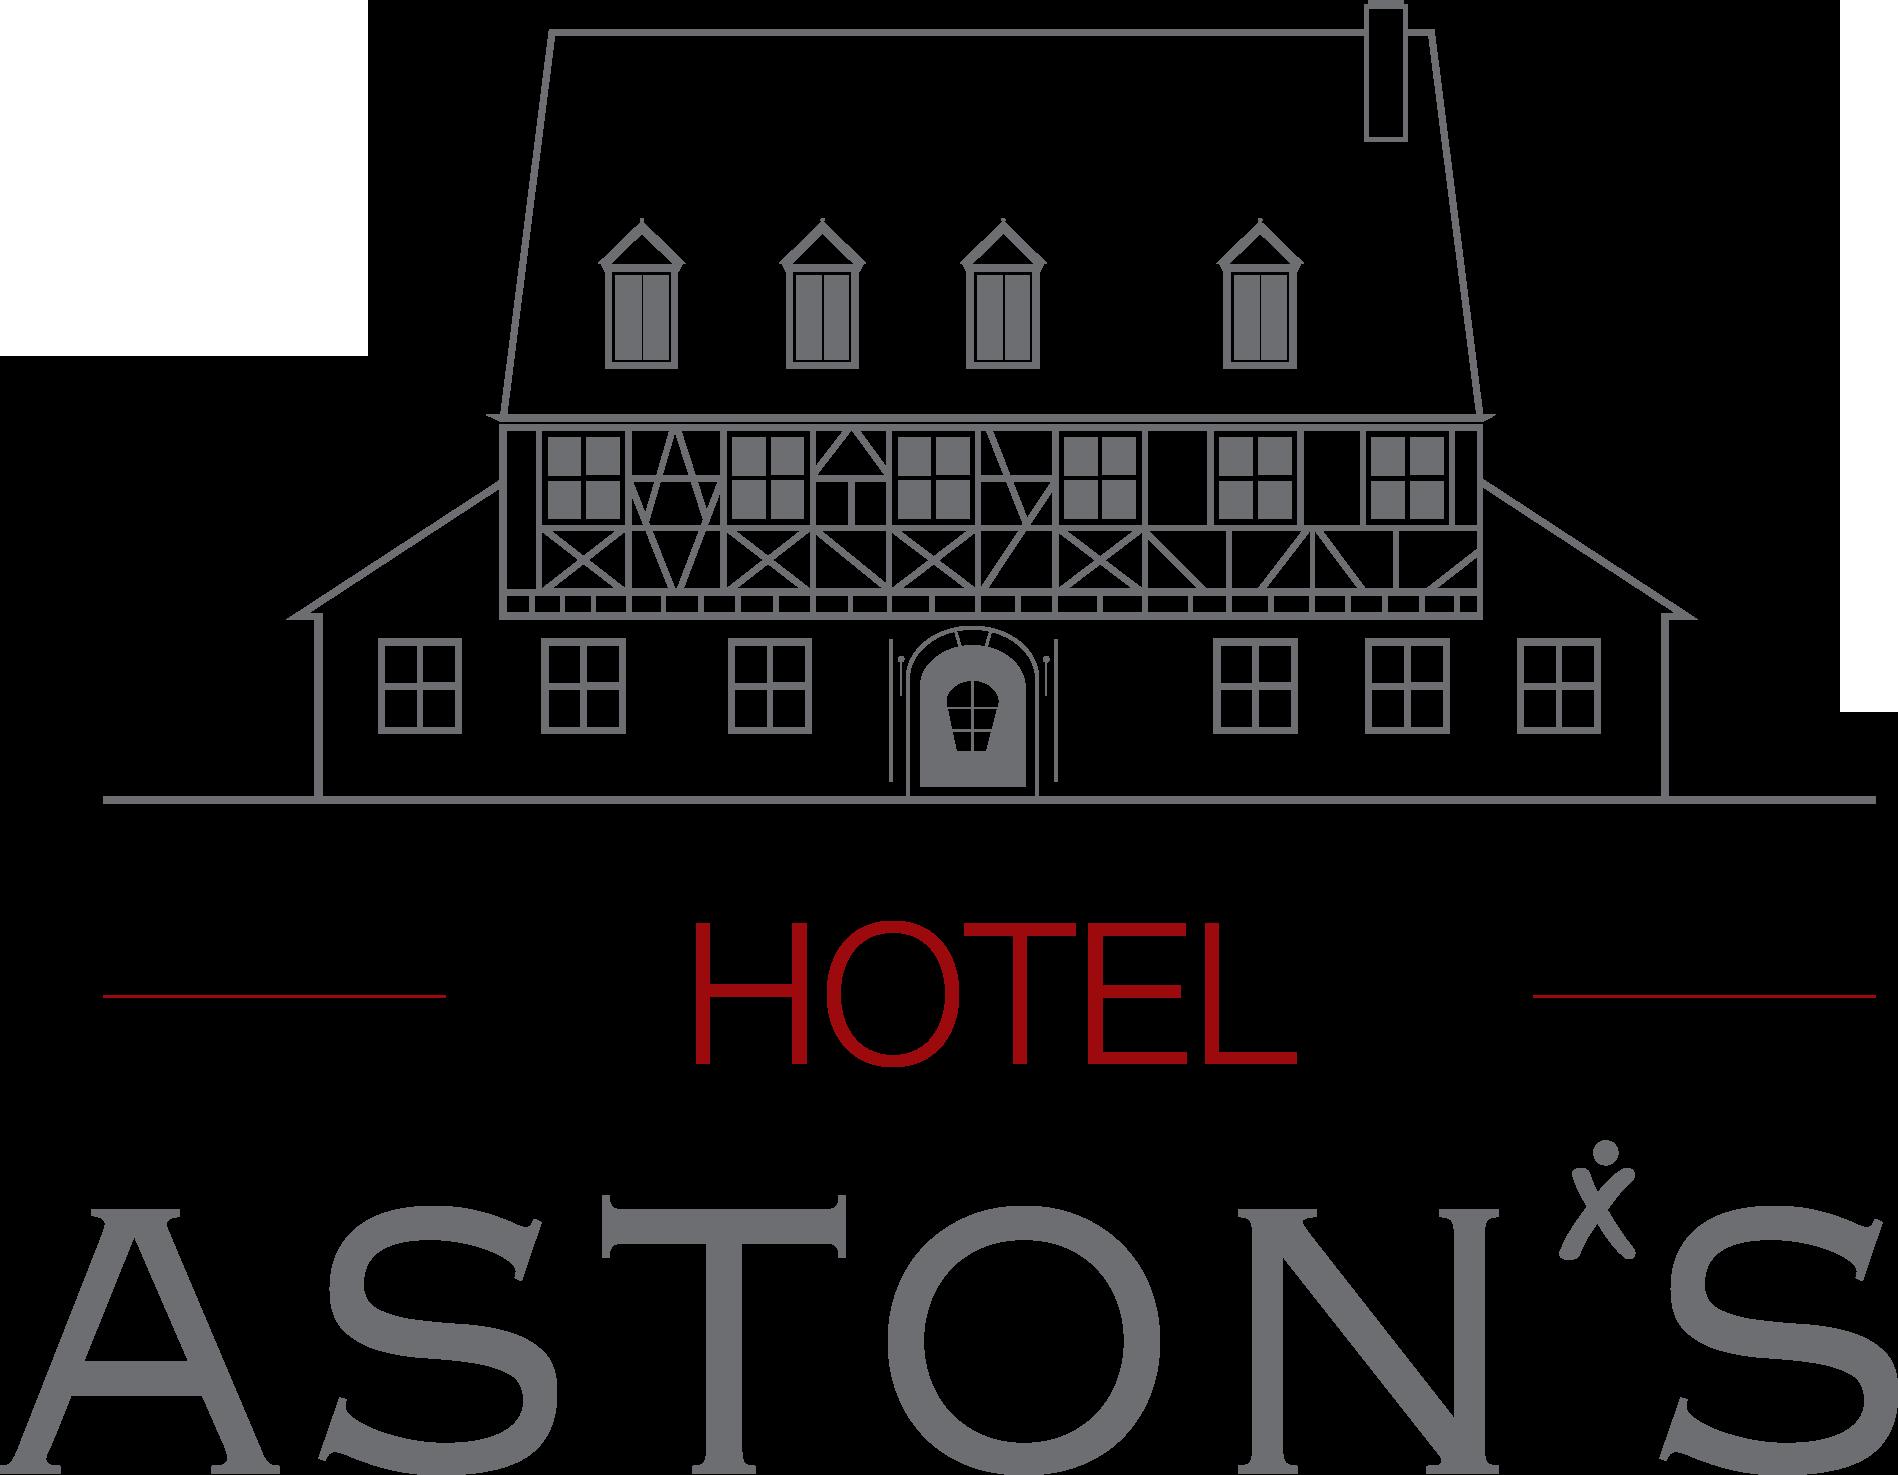 ASTON'S Hotel